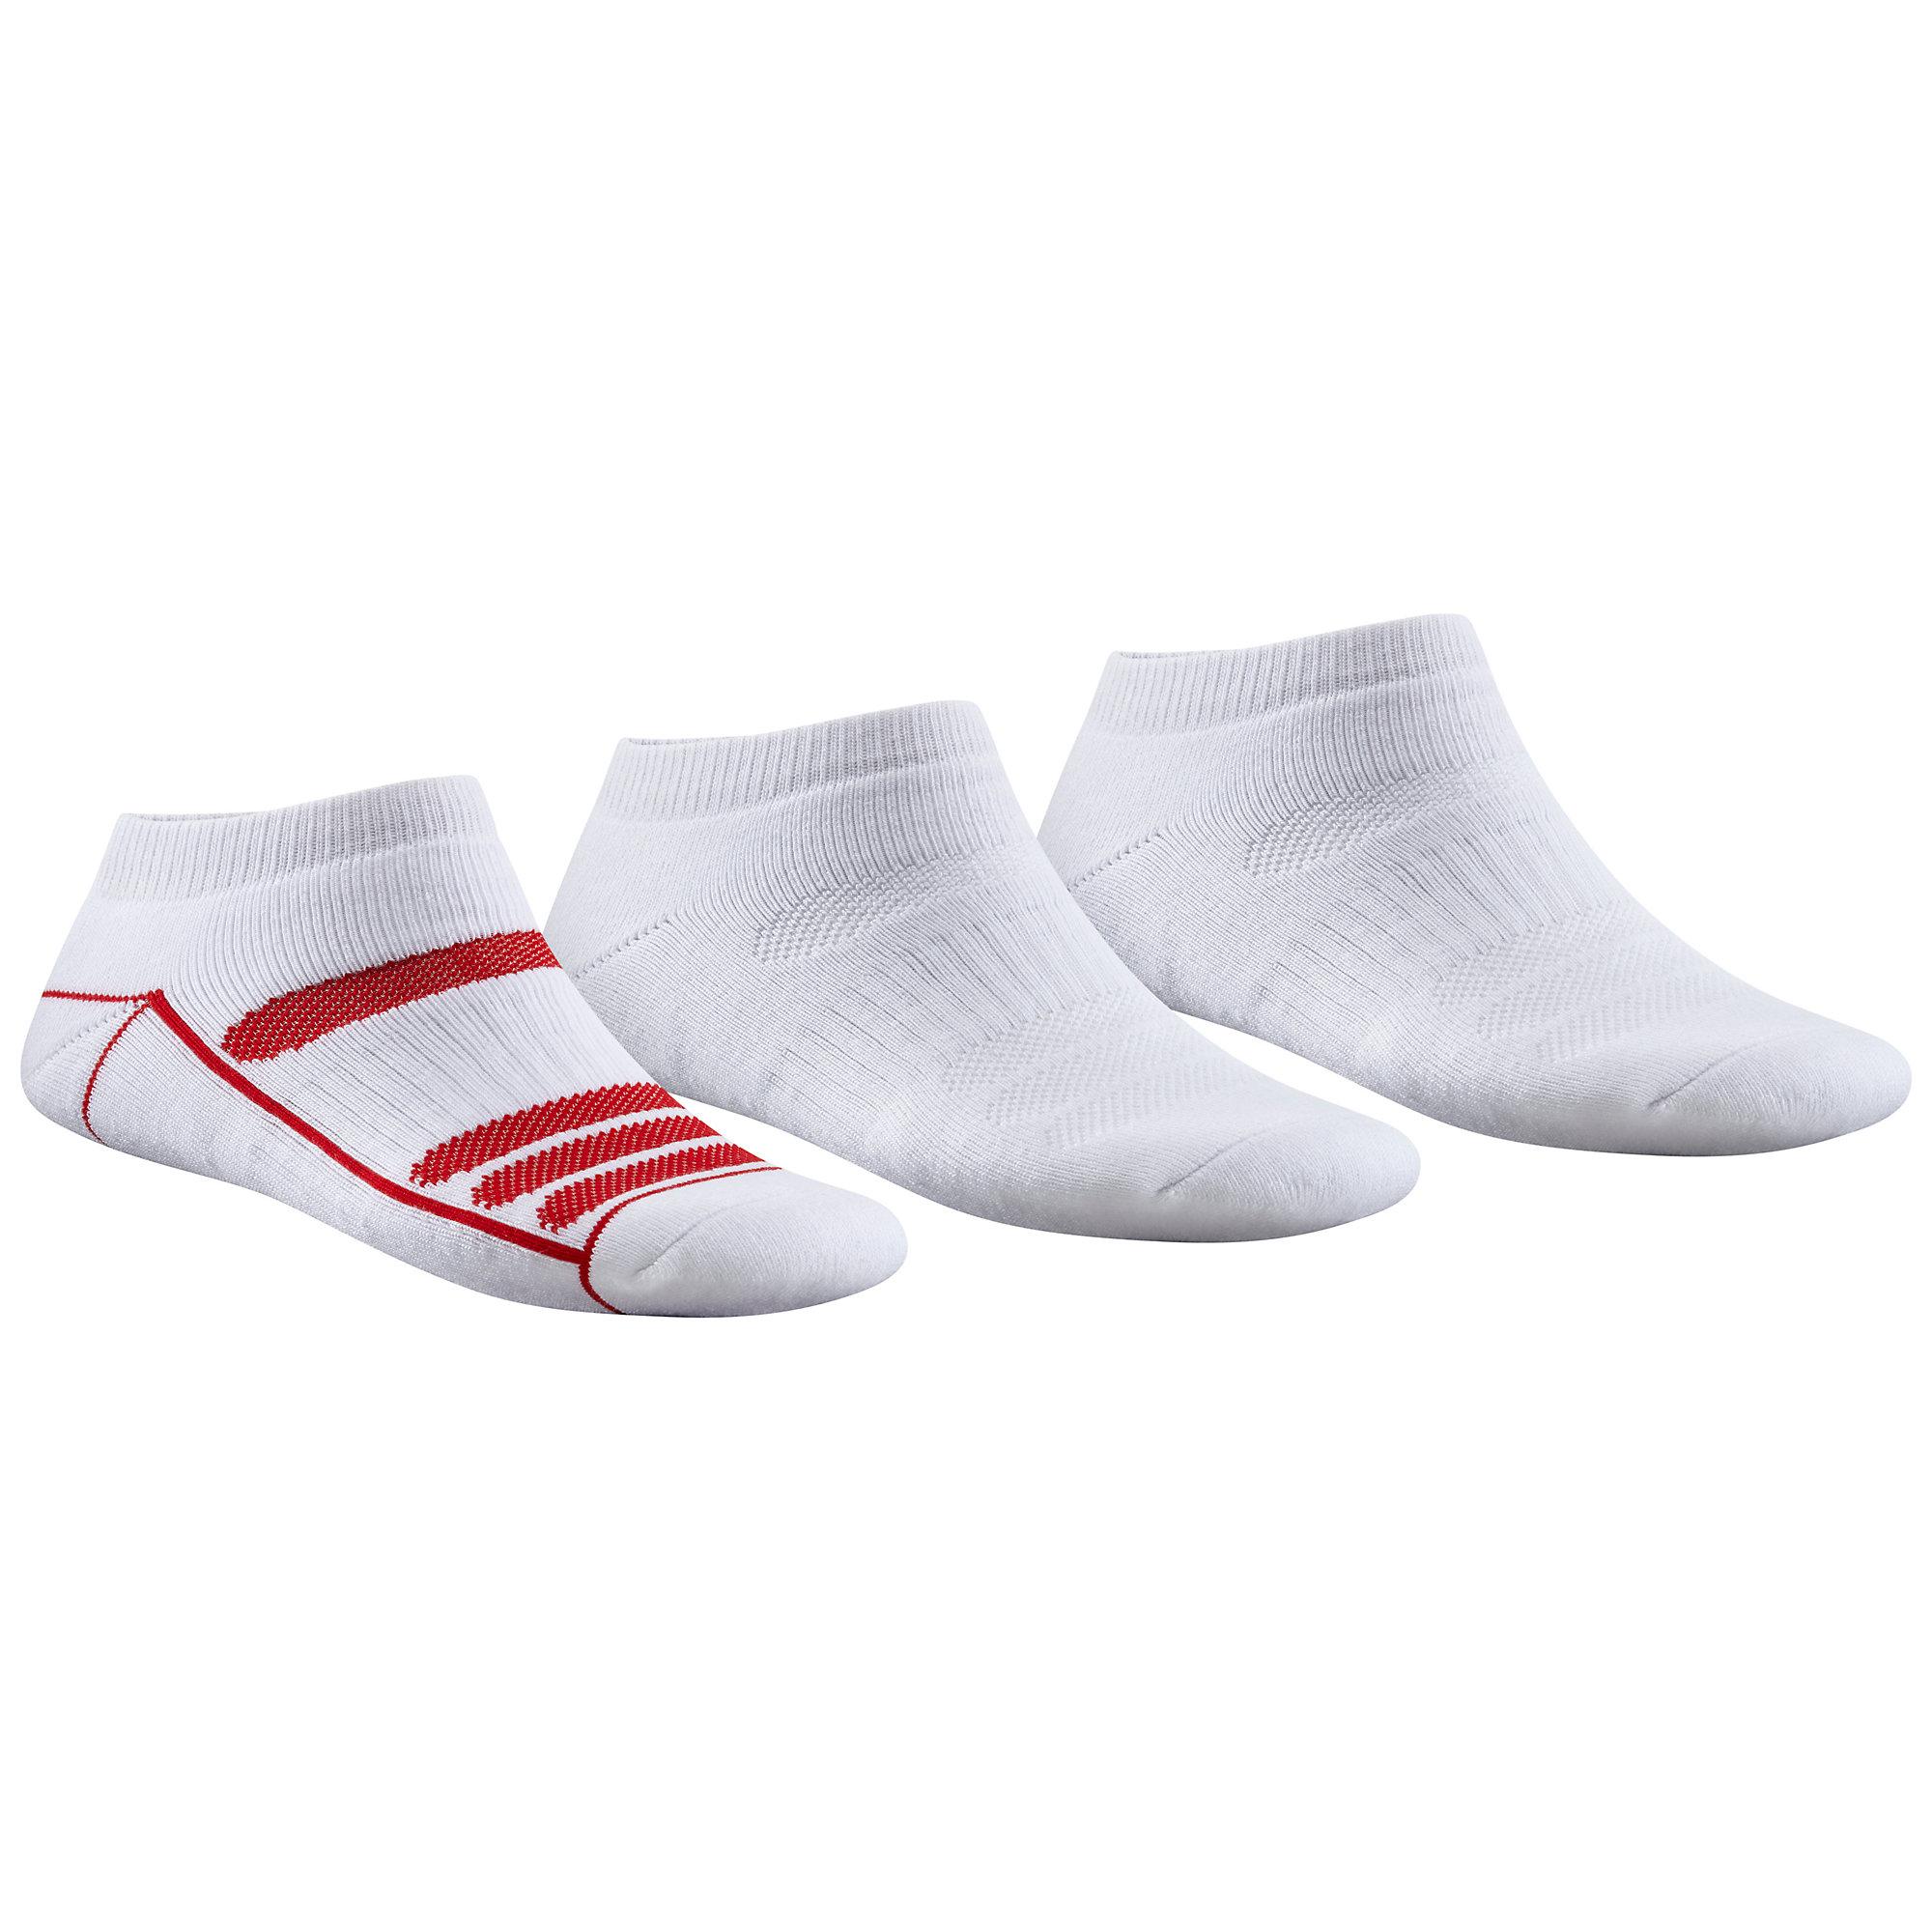 Columbia Men's Athletic Cushioned Low Cut Sock - 3 Pack- CS219M